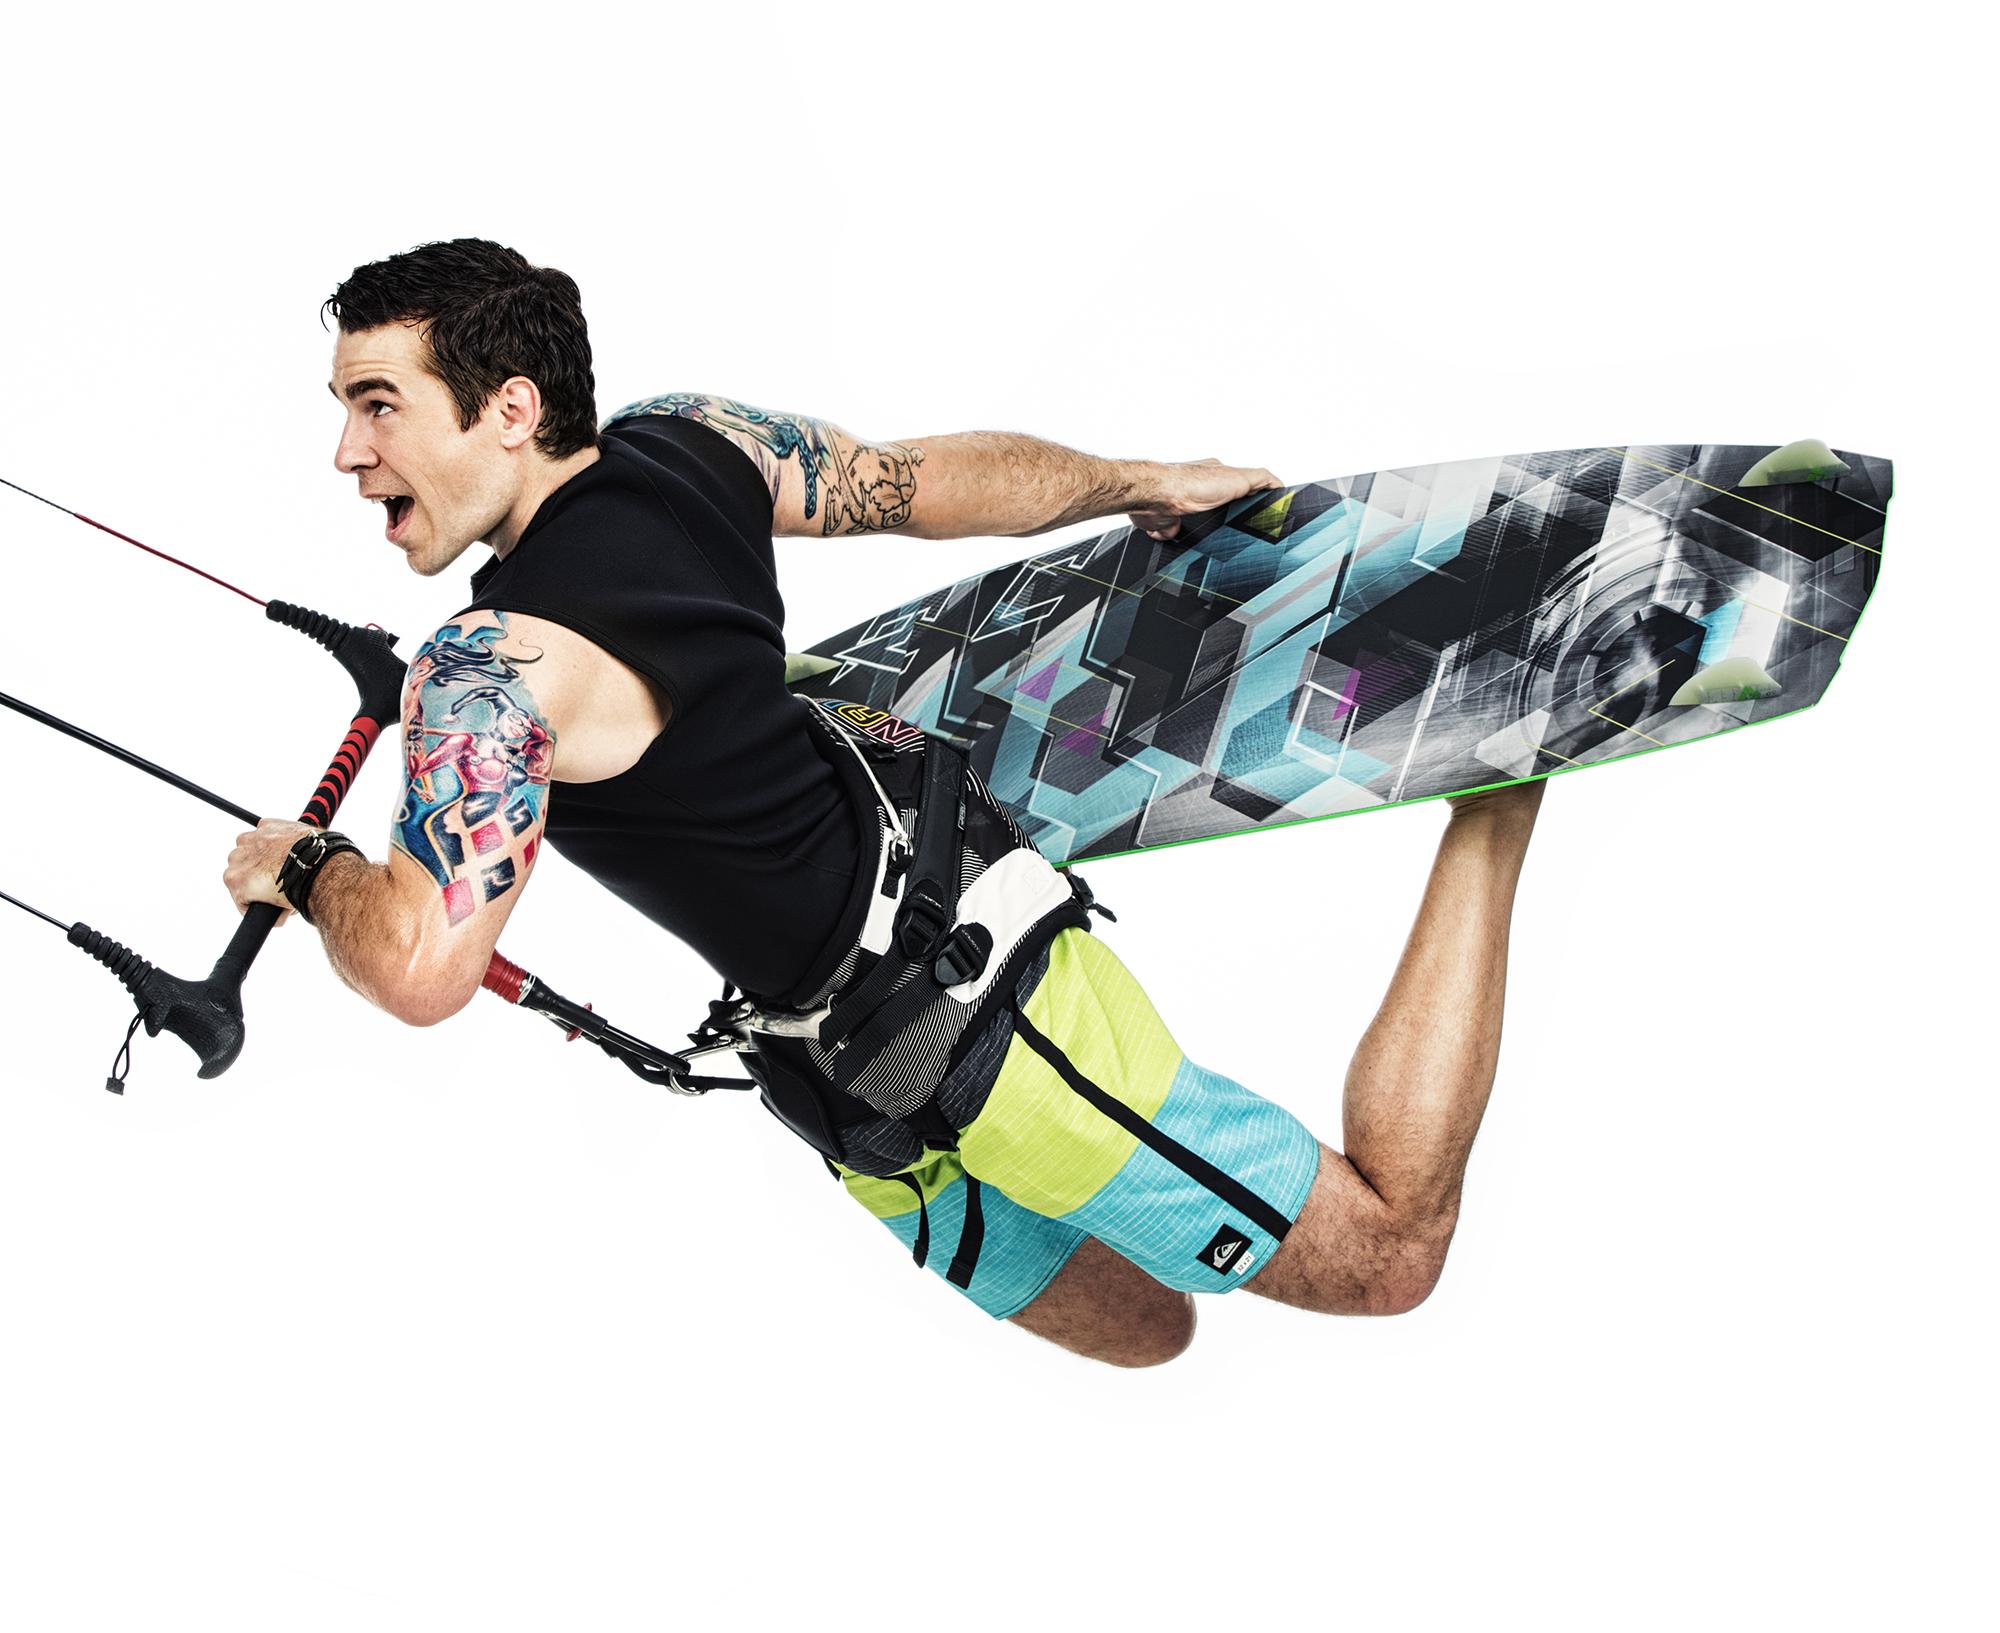 Kite surf! Photo : Marie-Pier Lafontaine & Remy Dussud